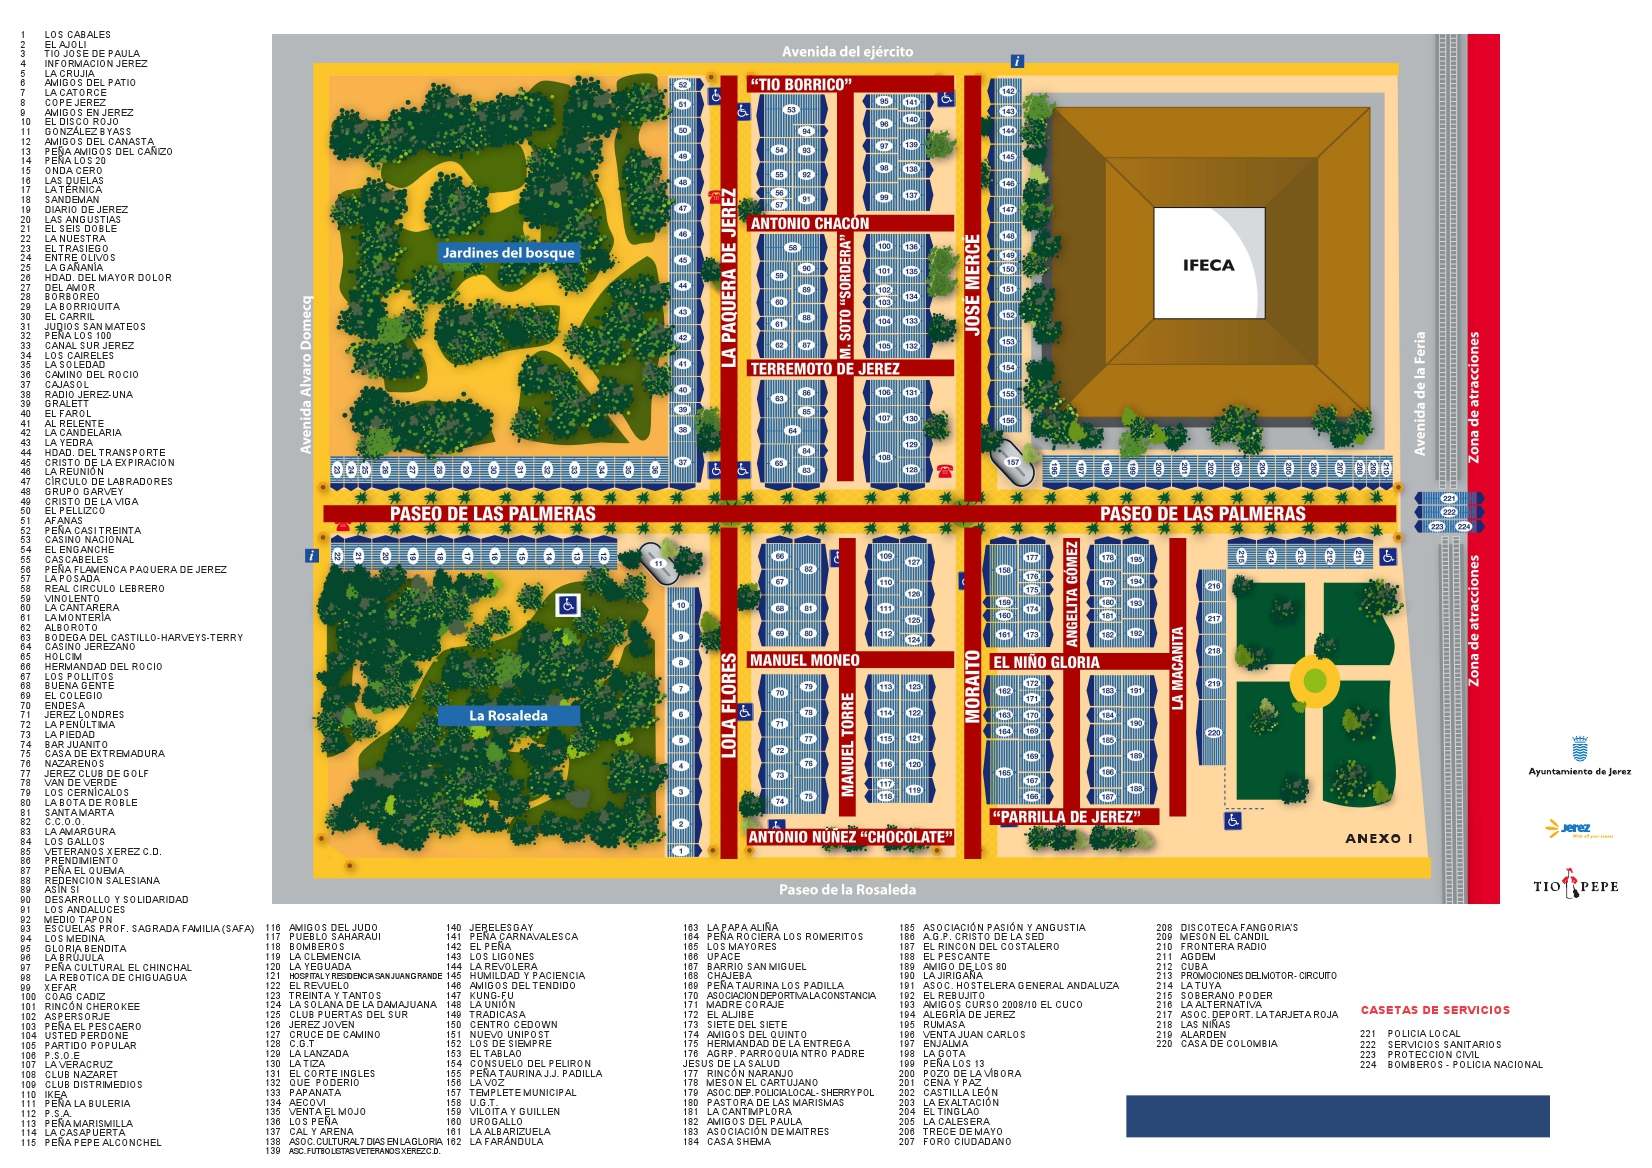 Plano de casetas de la Feria del Caballo 2012